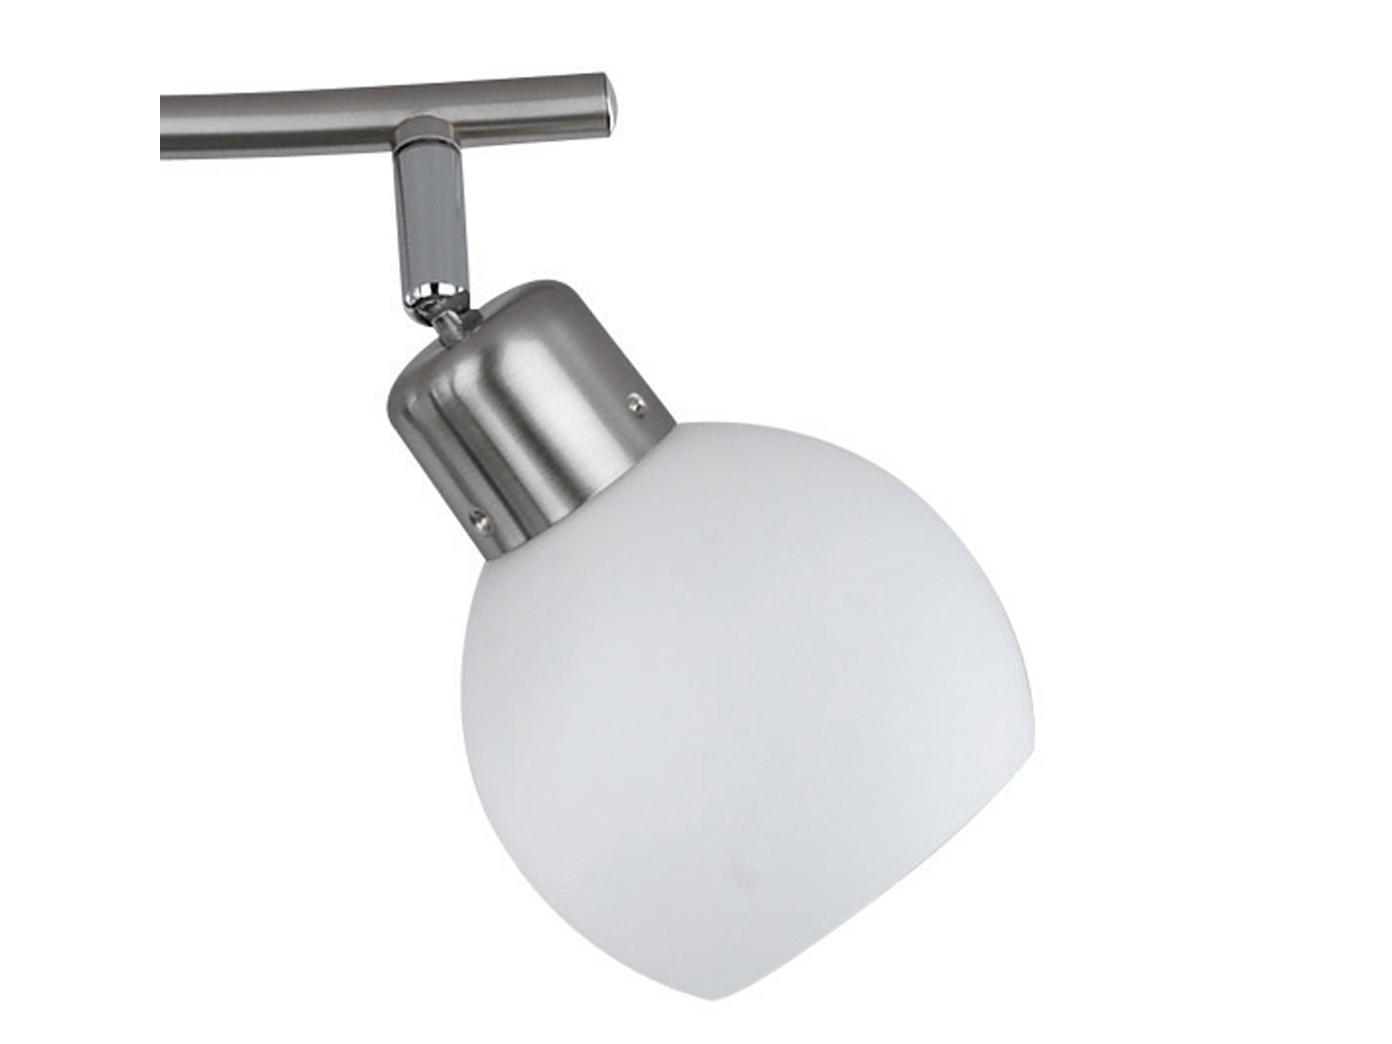 4 x 4 W LEDs Rostfarben inkl max Trio LED-Deckenschiene 60 cm